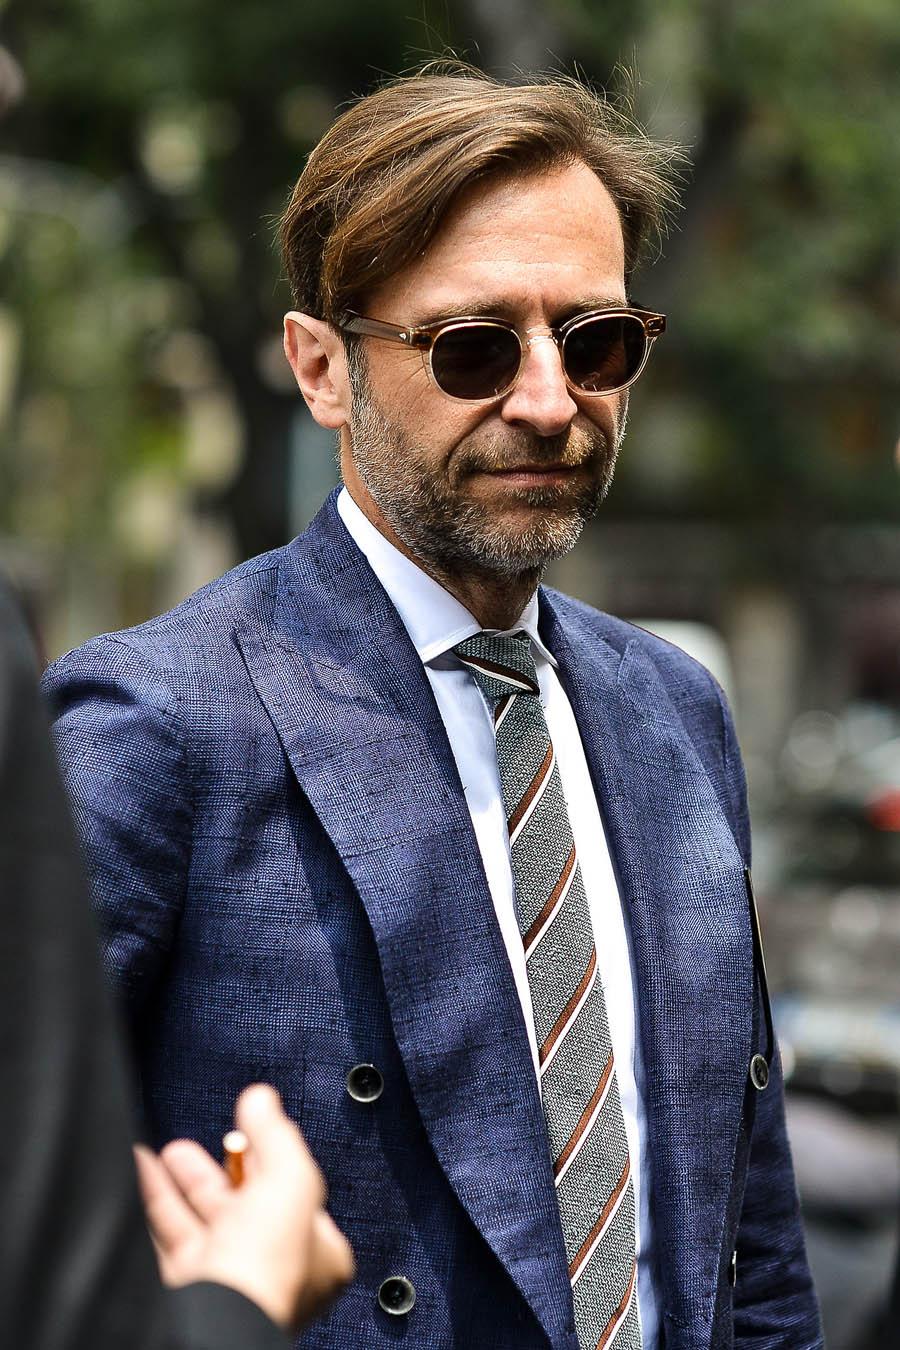 Street Style, Milan - Beard & Fabric